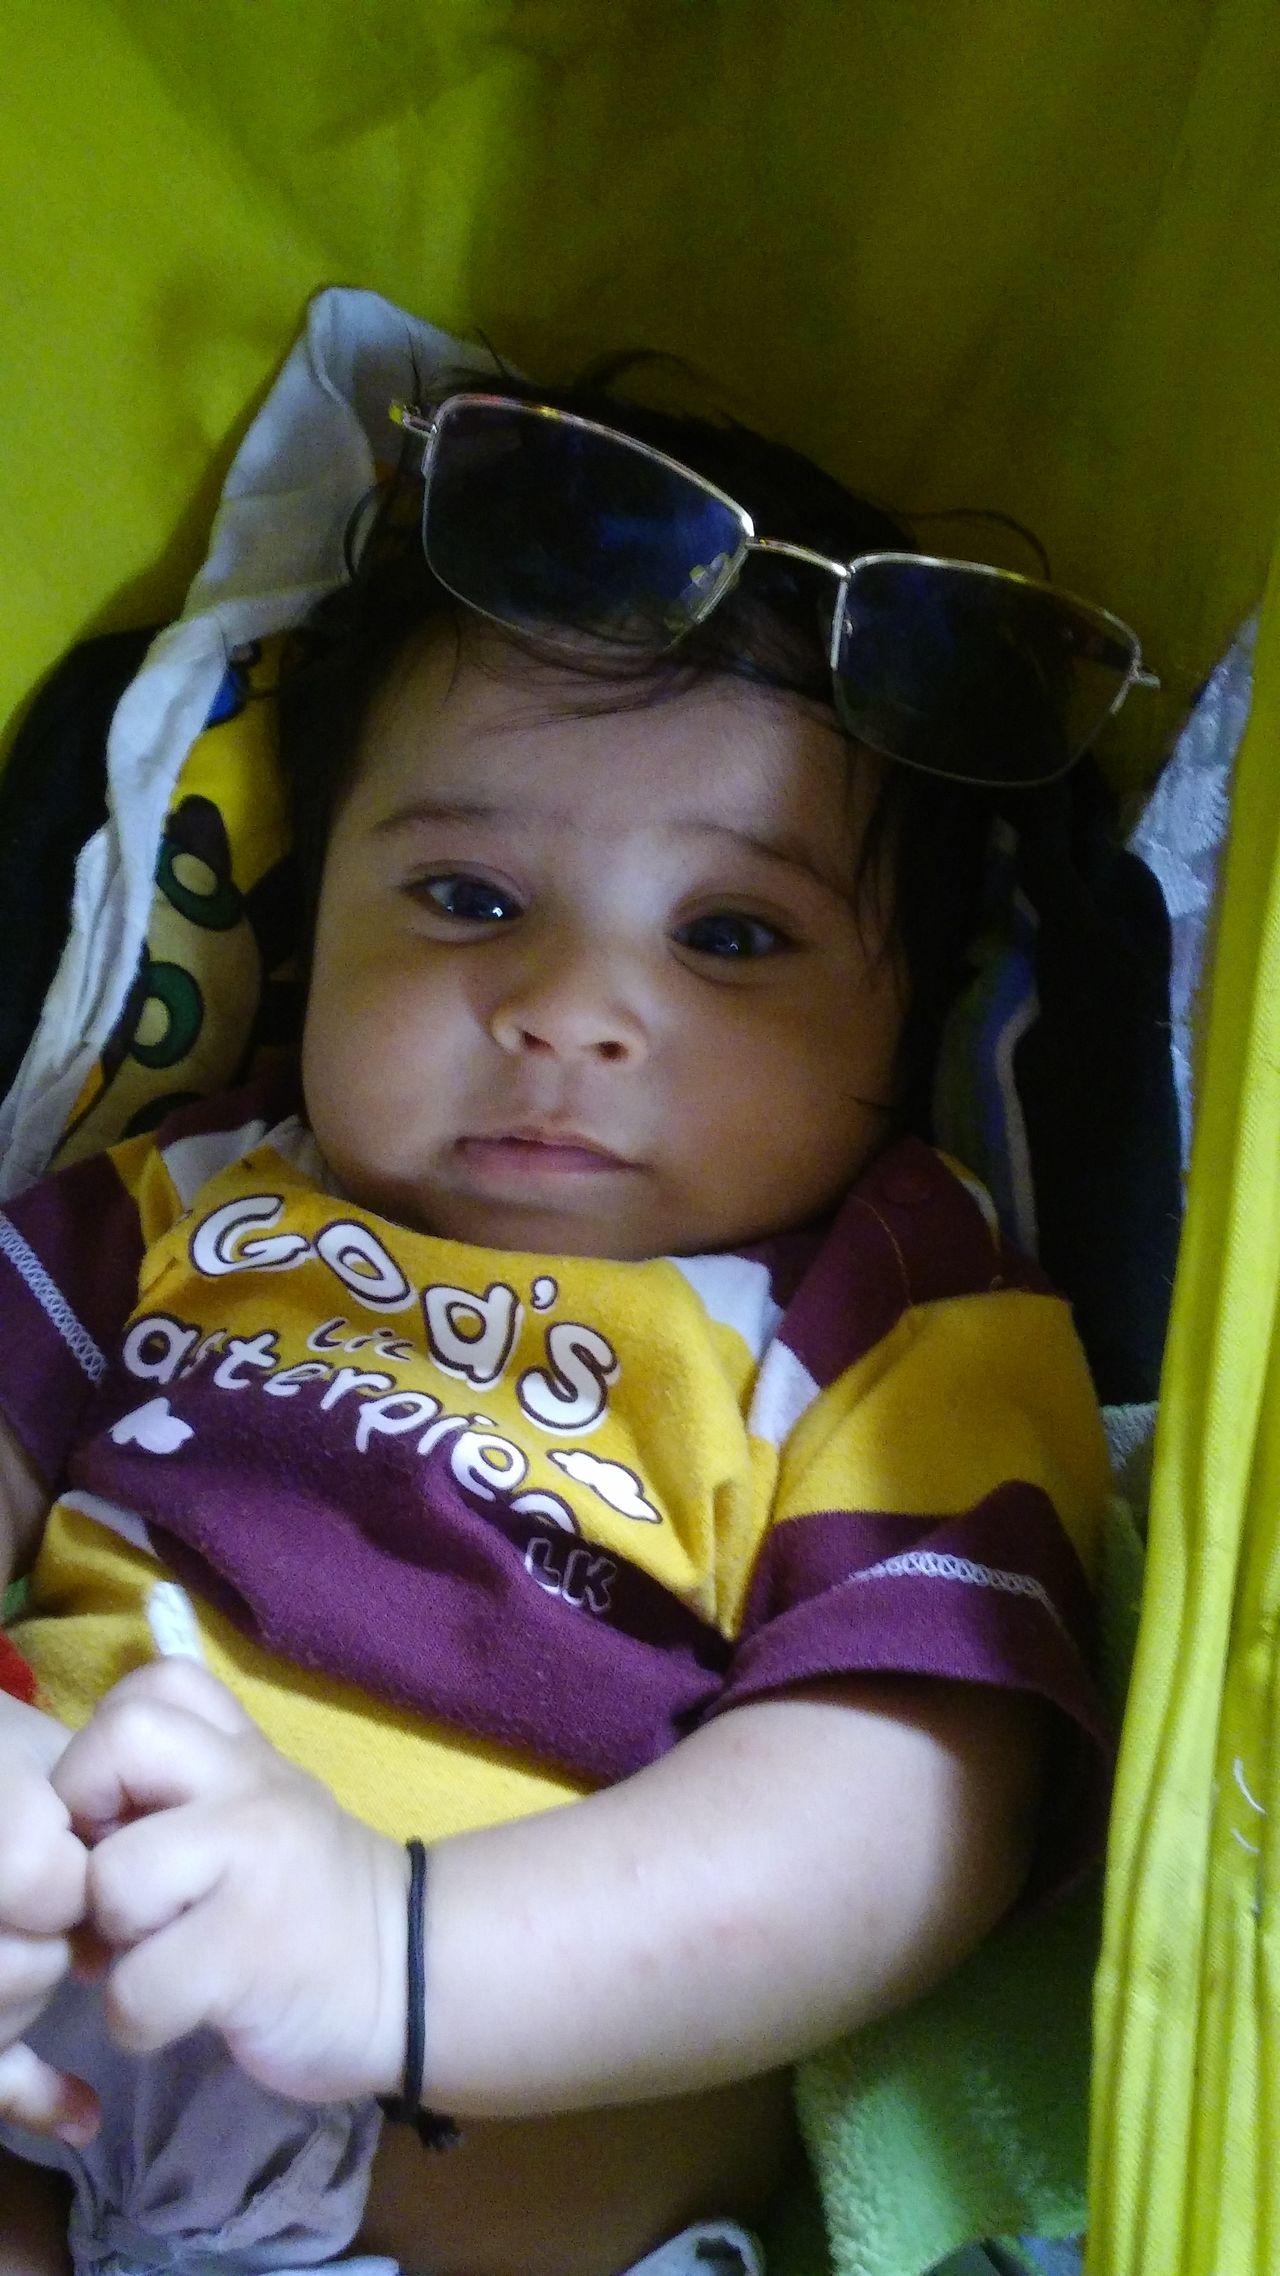 New Born Eye Glasses Child Kid Cradle